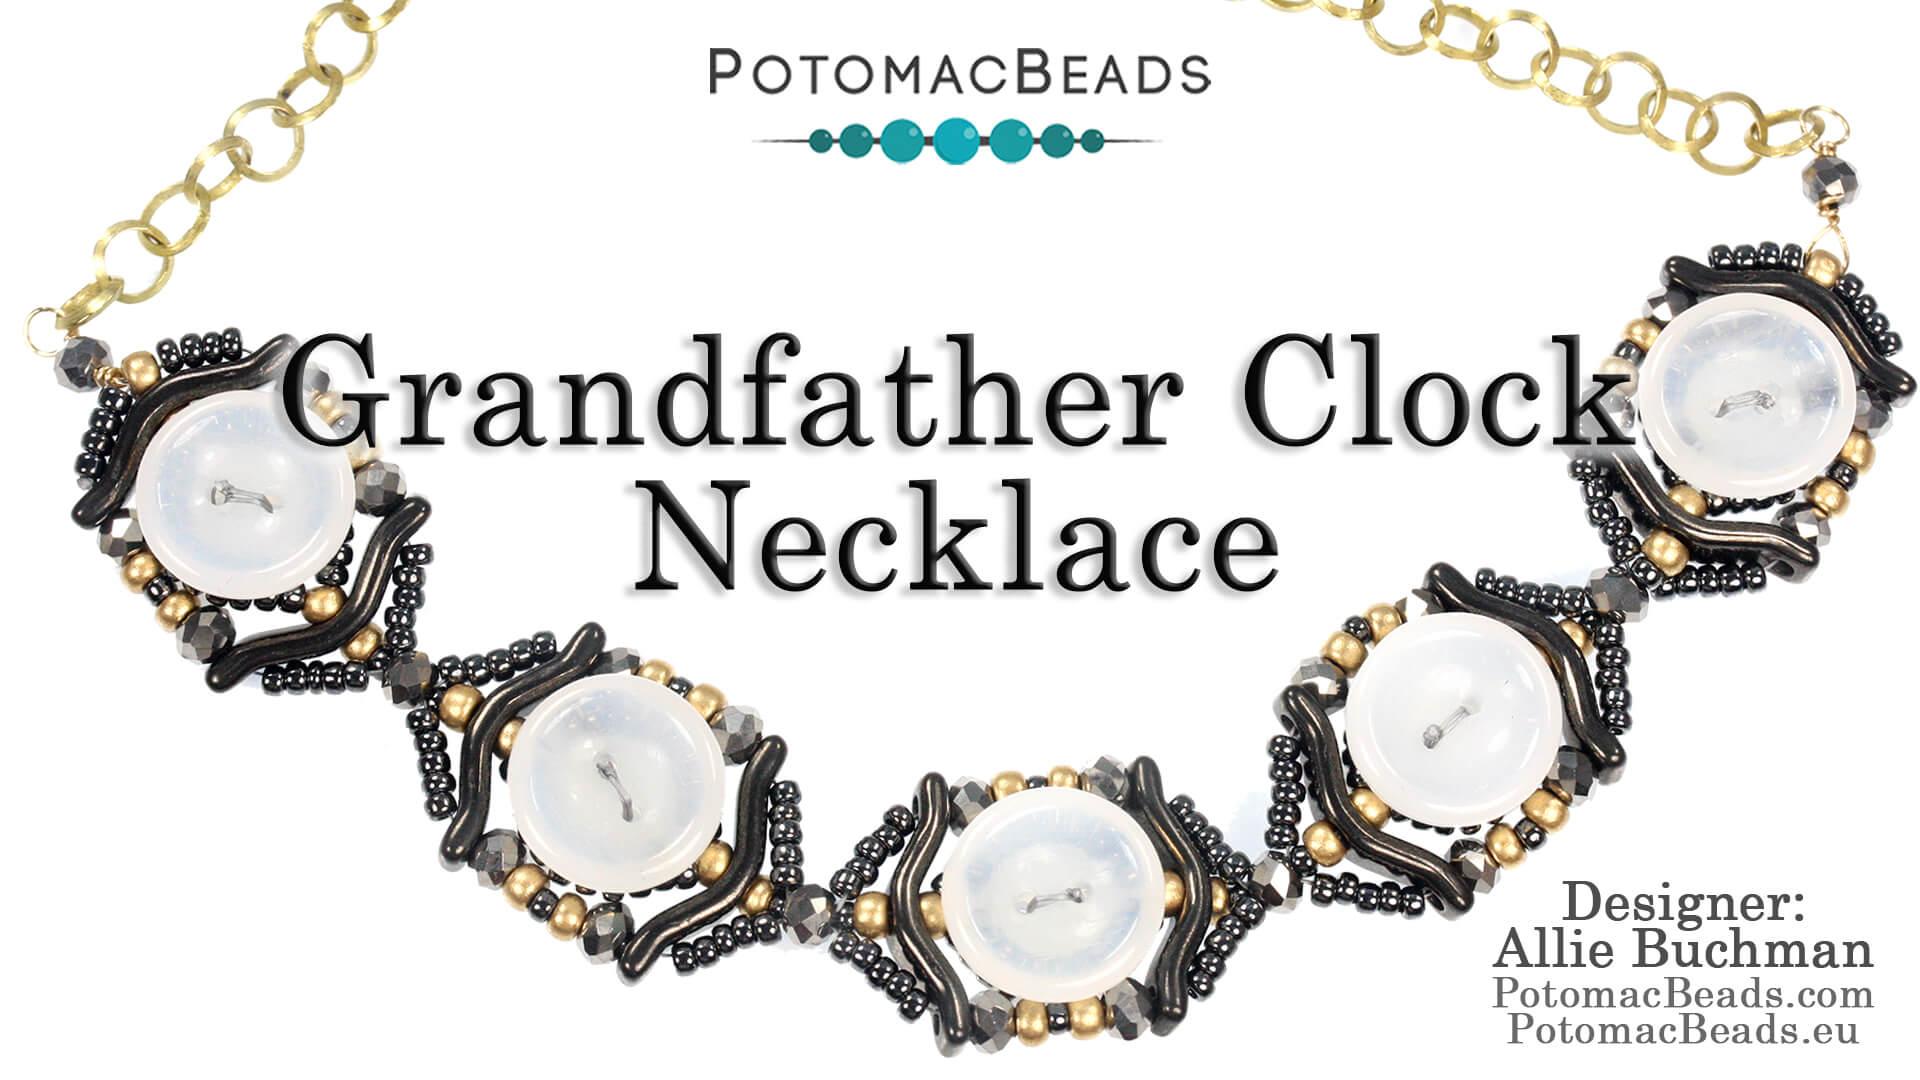 How to Bead Jewelry / Beading Tutorials & Jewel Making Videos / Bead Weaving Tutorials & Necklace Tutorial / Grandfather Clock Necklace Tutorial